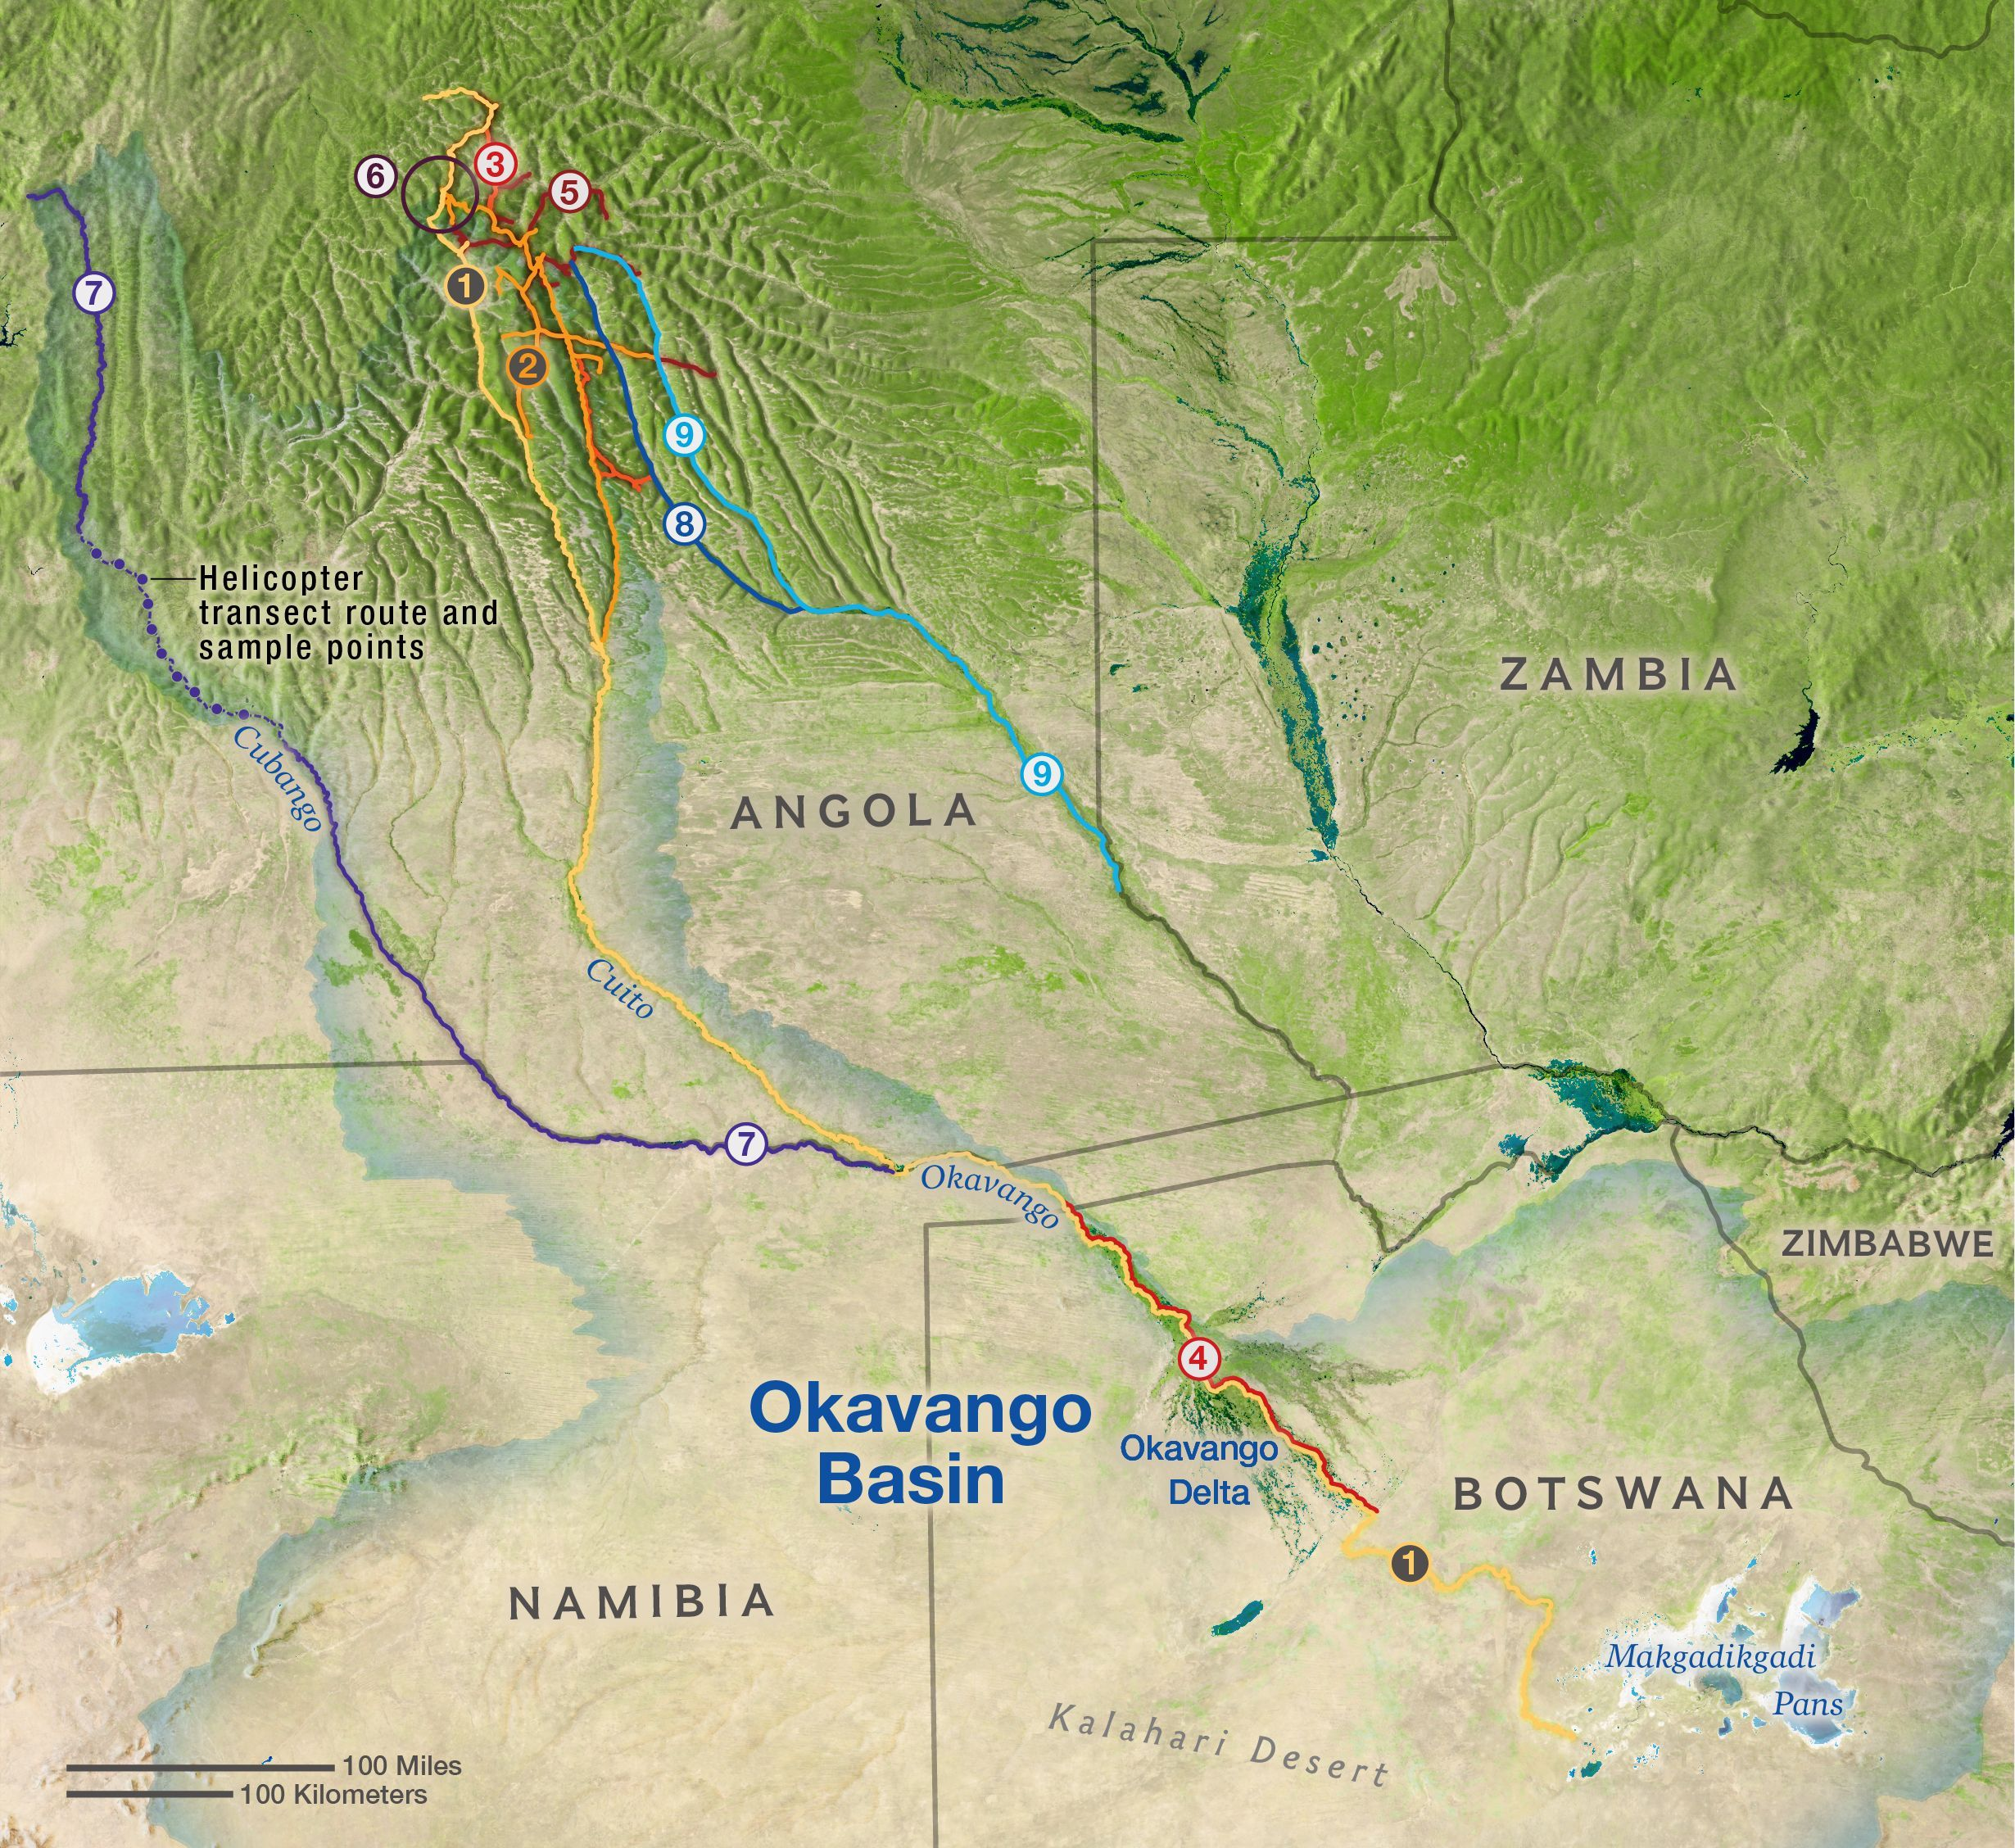 Okavango Wilderness Project | National Geographic Society